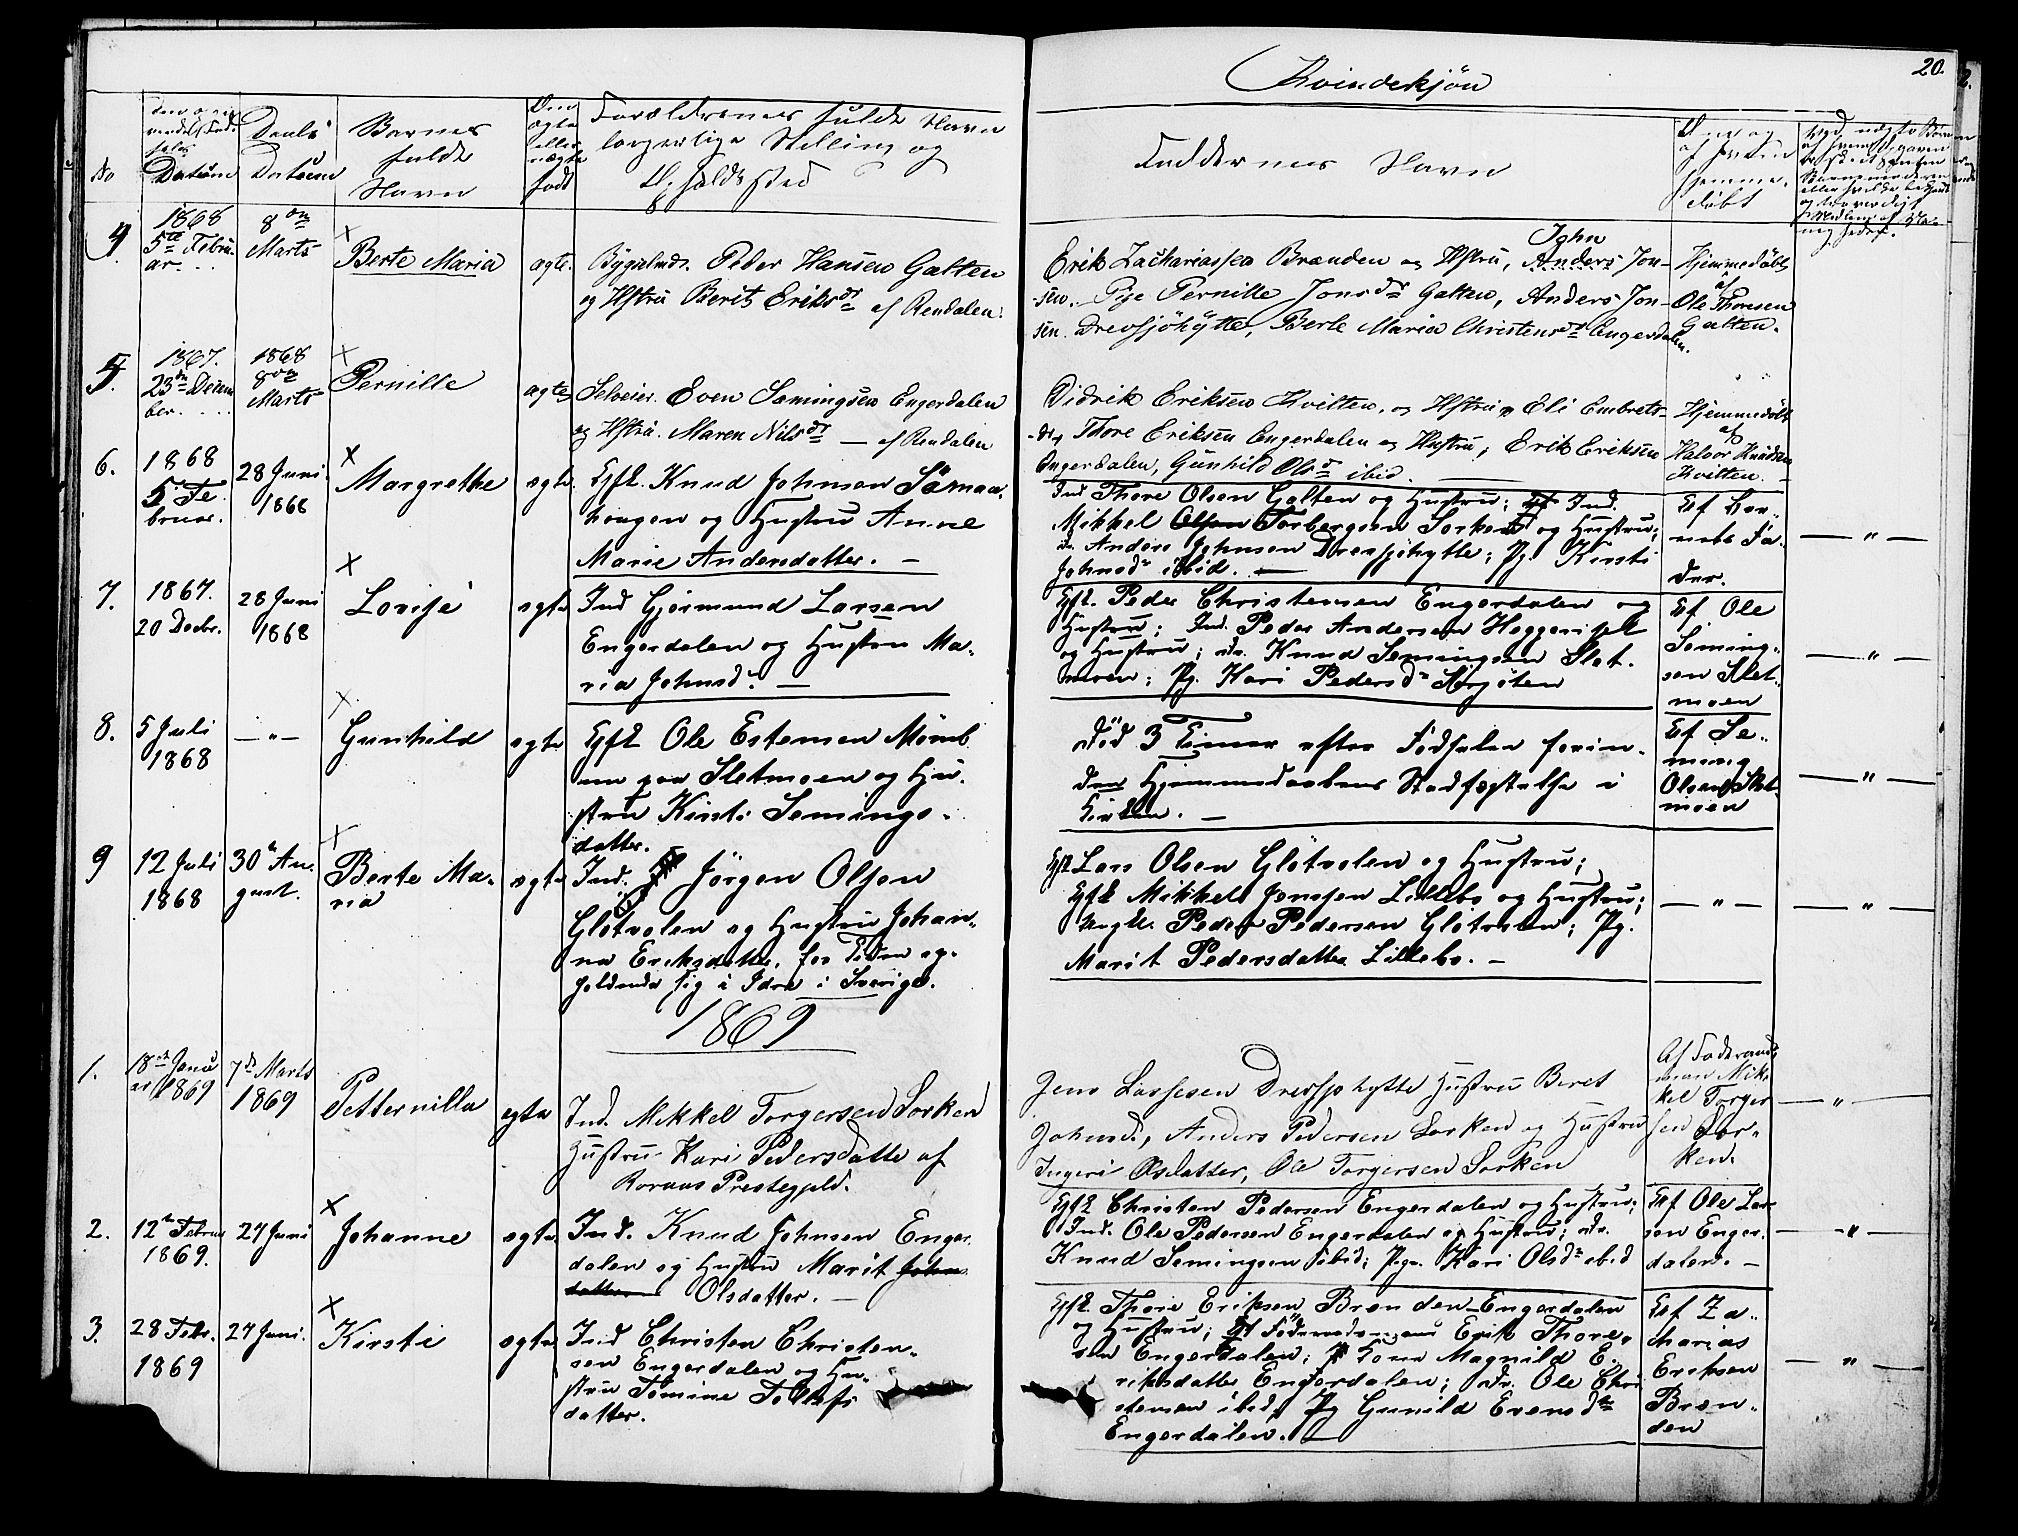 SAH, Rendalen prestekontor, H/Ha/Hab/L0002: Parish register (copy) no. 2, 1858-1880, p. 20